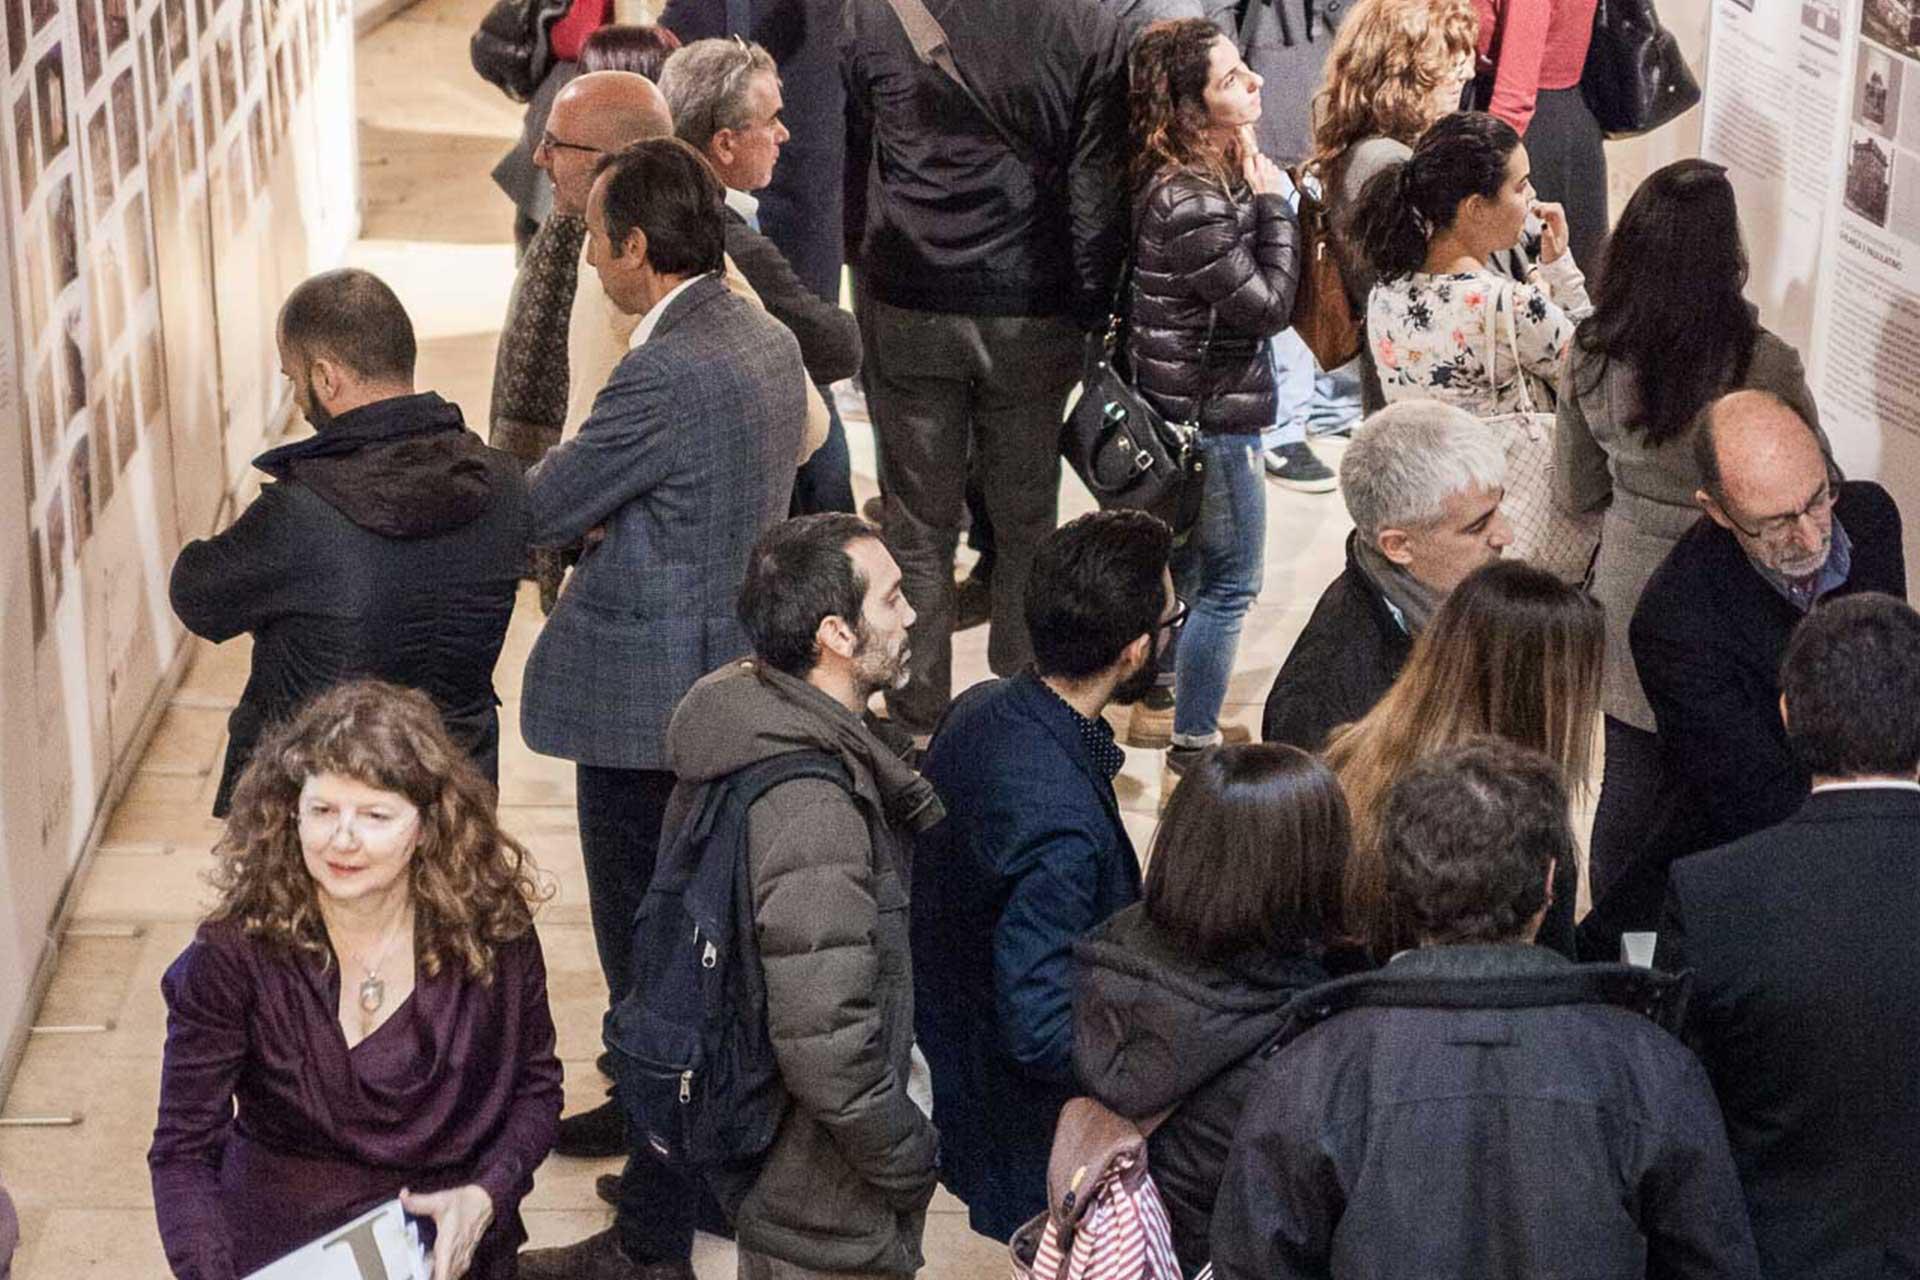 Fontane di Sardegna - Mostre e Convegni - 11 oriz